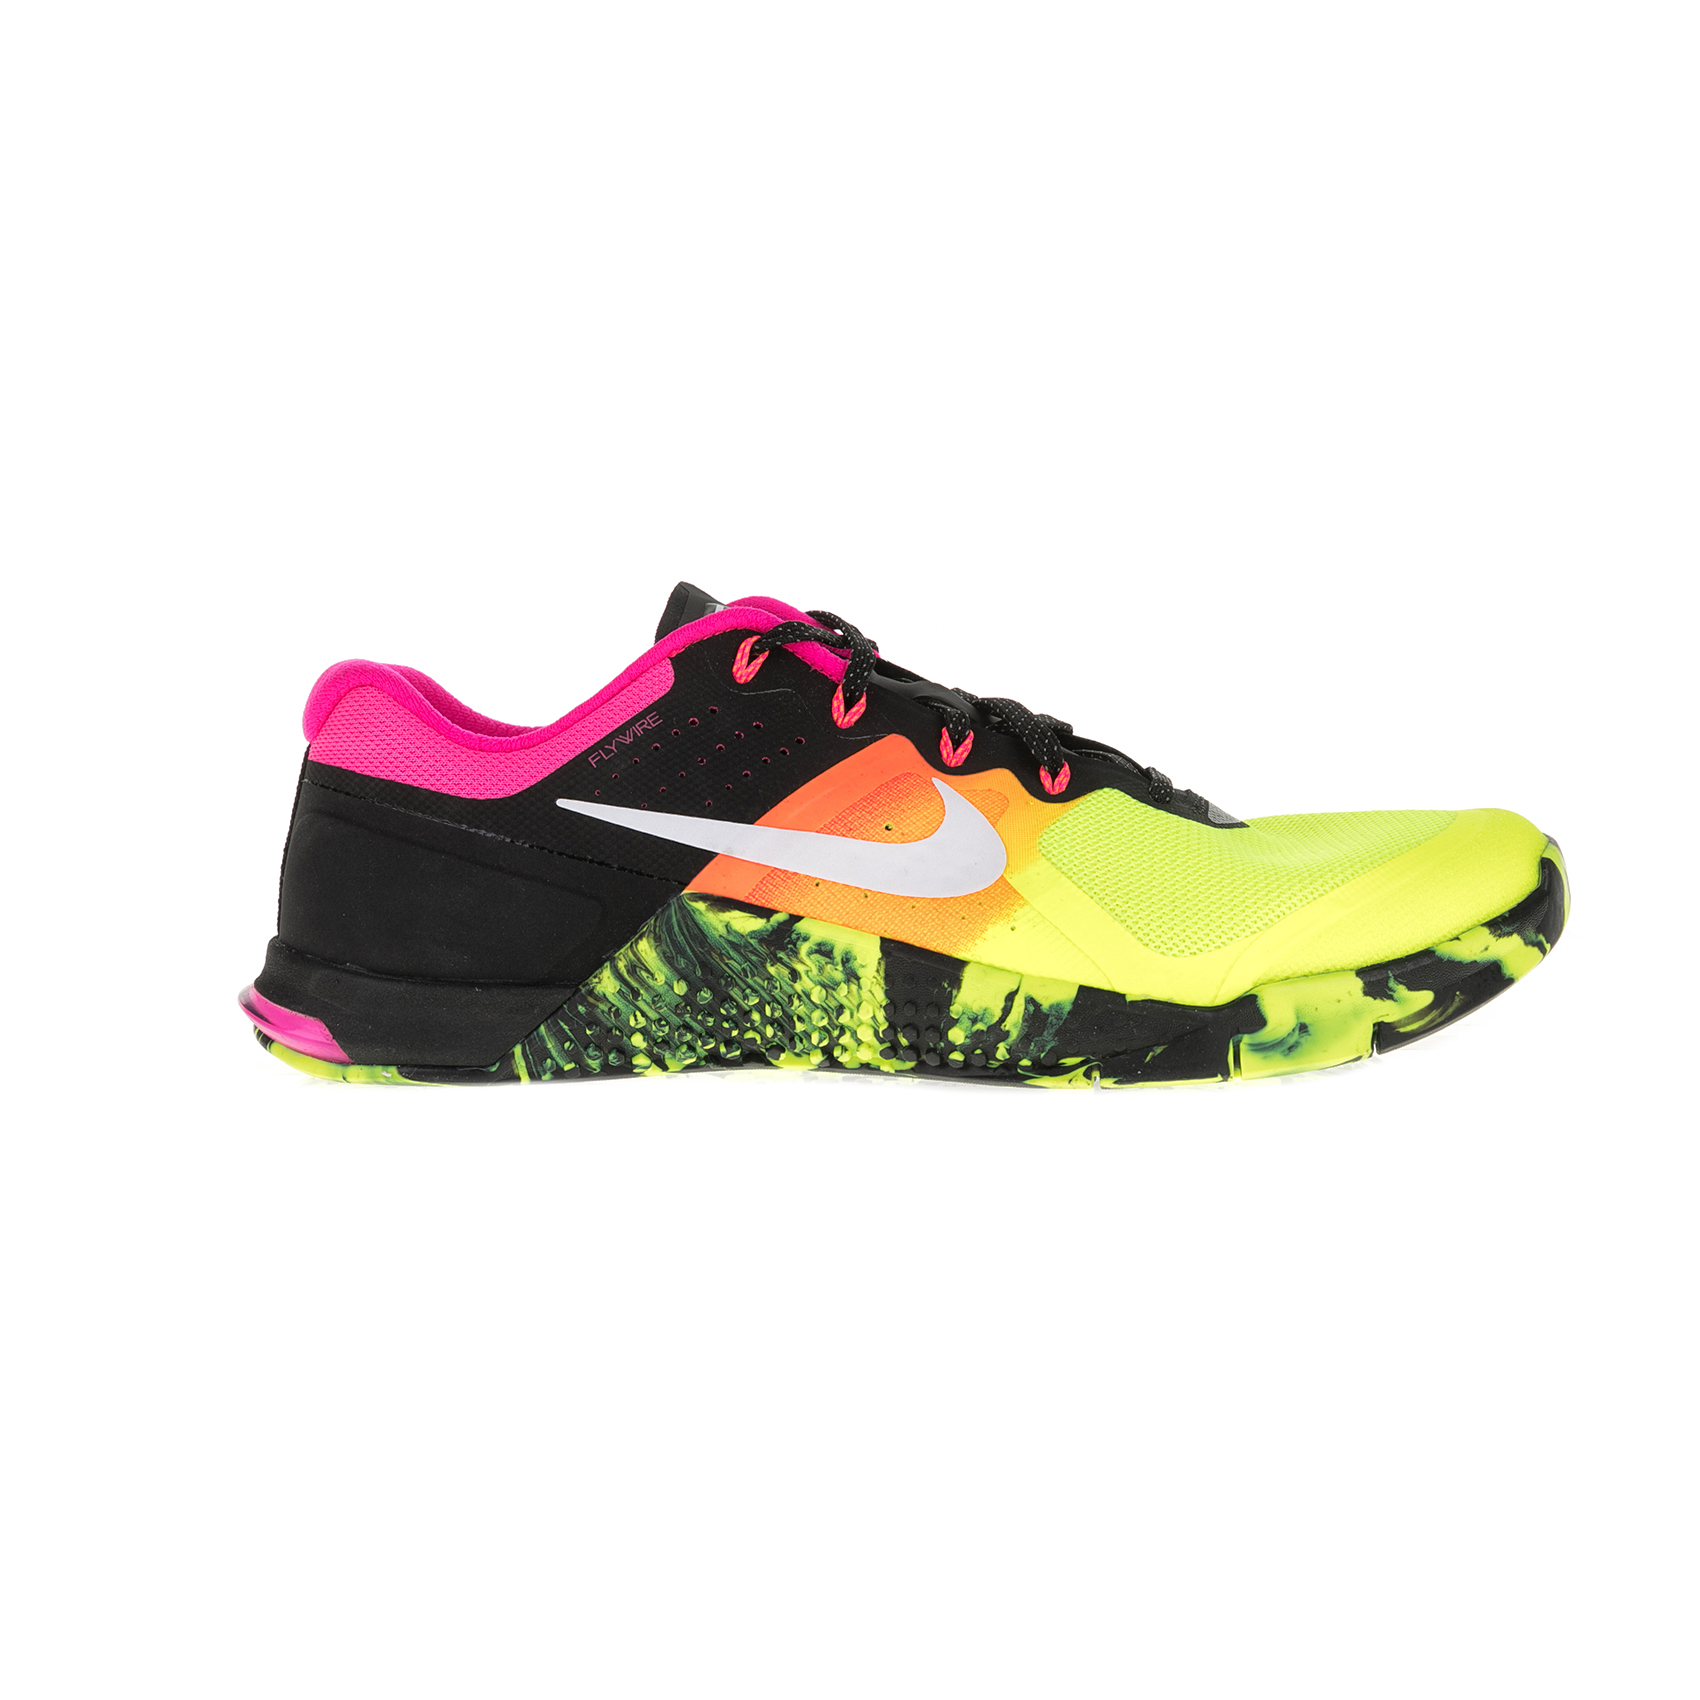 NIKE – Γυναικεία αθλητικά παπούτσια NIKE METCON 2 κίτρινα-μαύρα